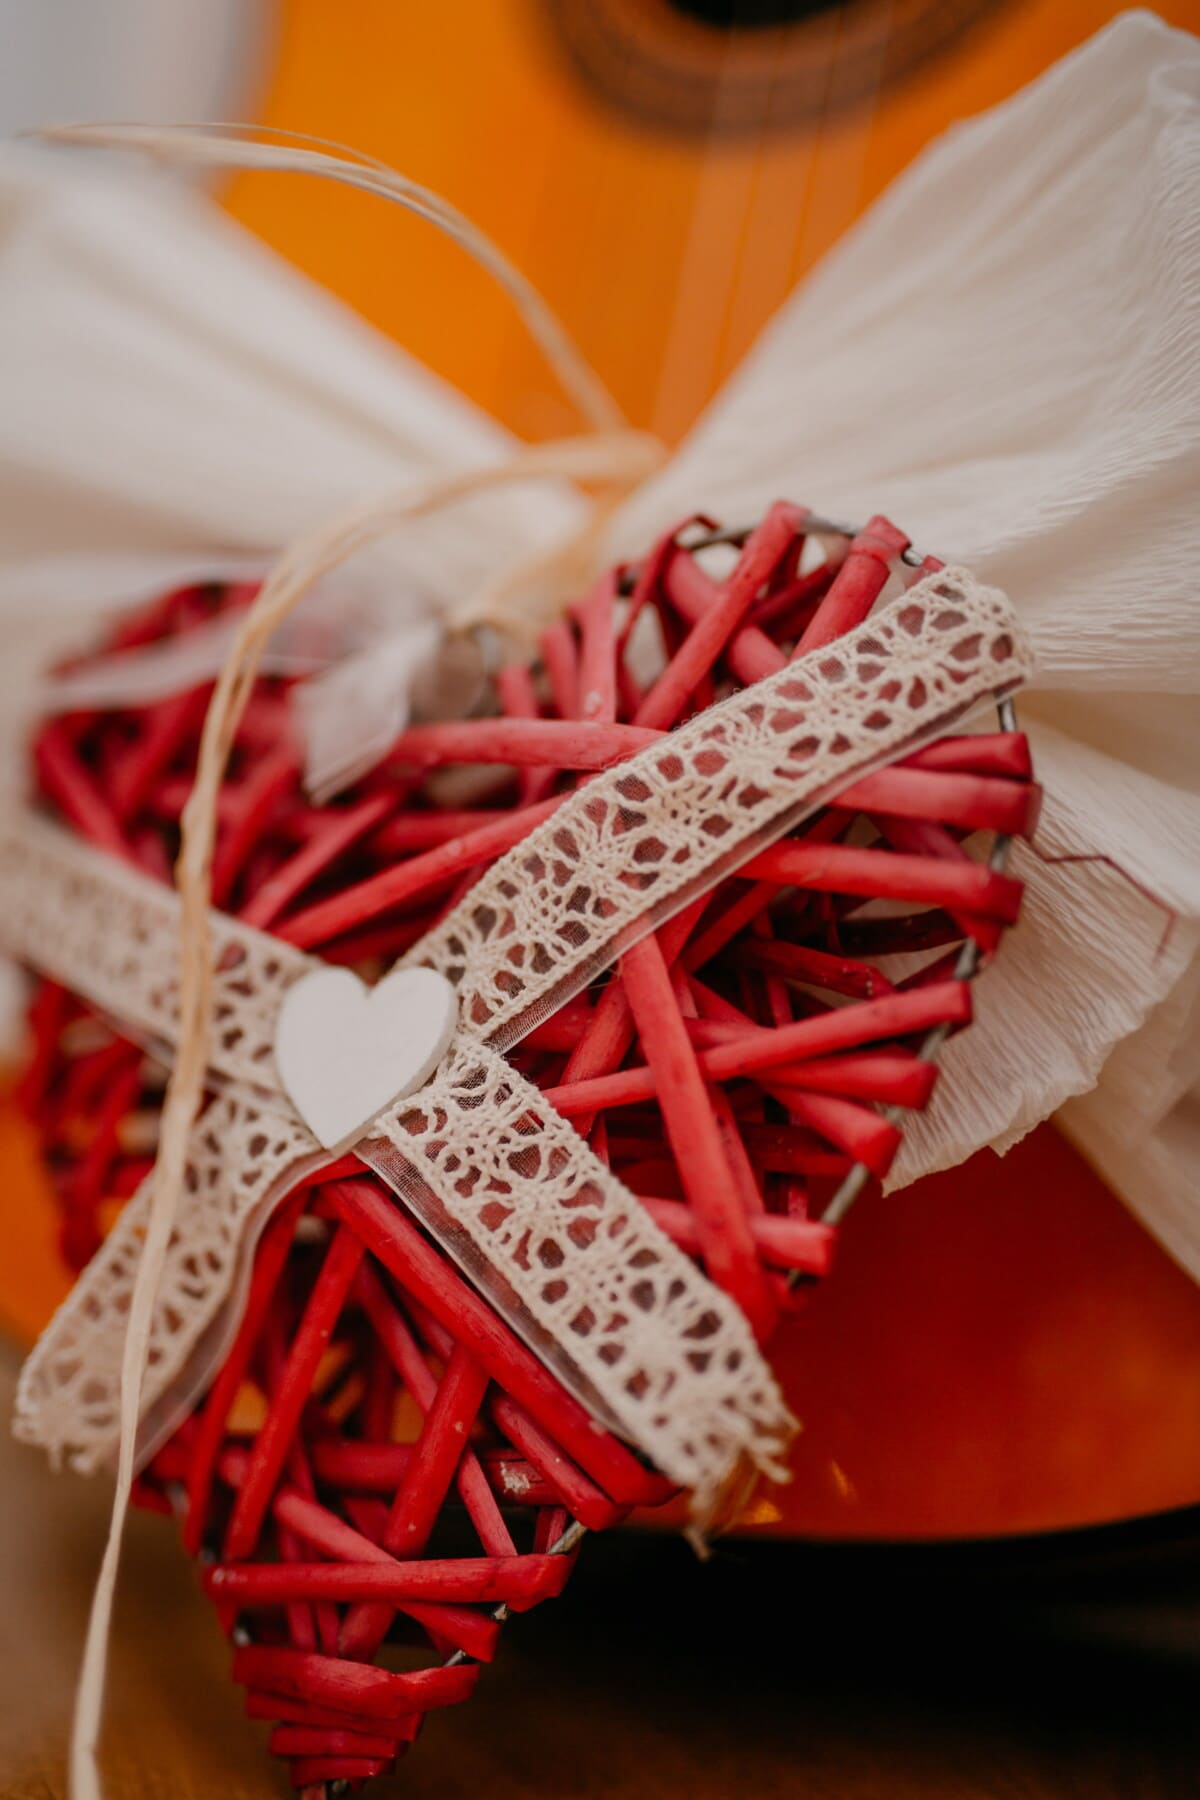 handmade, reddish, heart, gifts, romantic, wood, still life, traditional, fashion, color